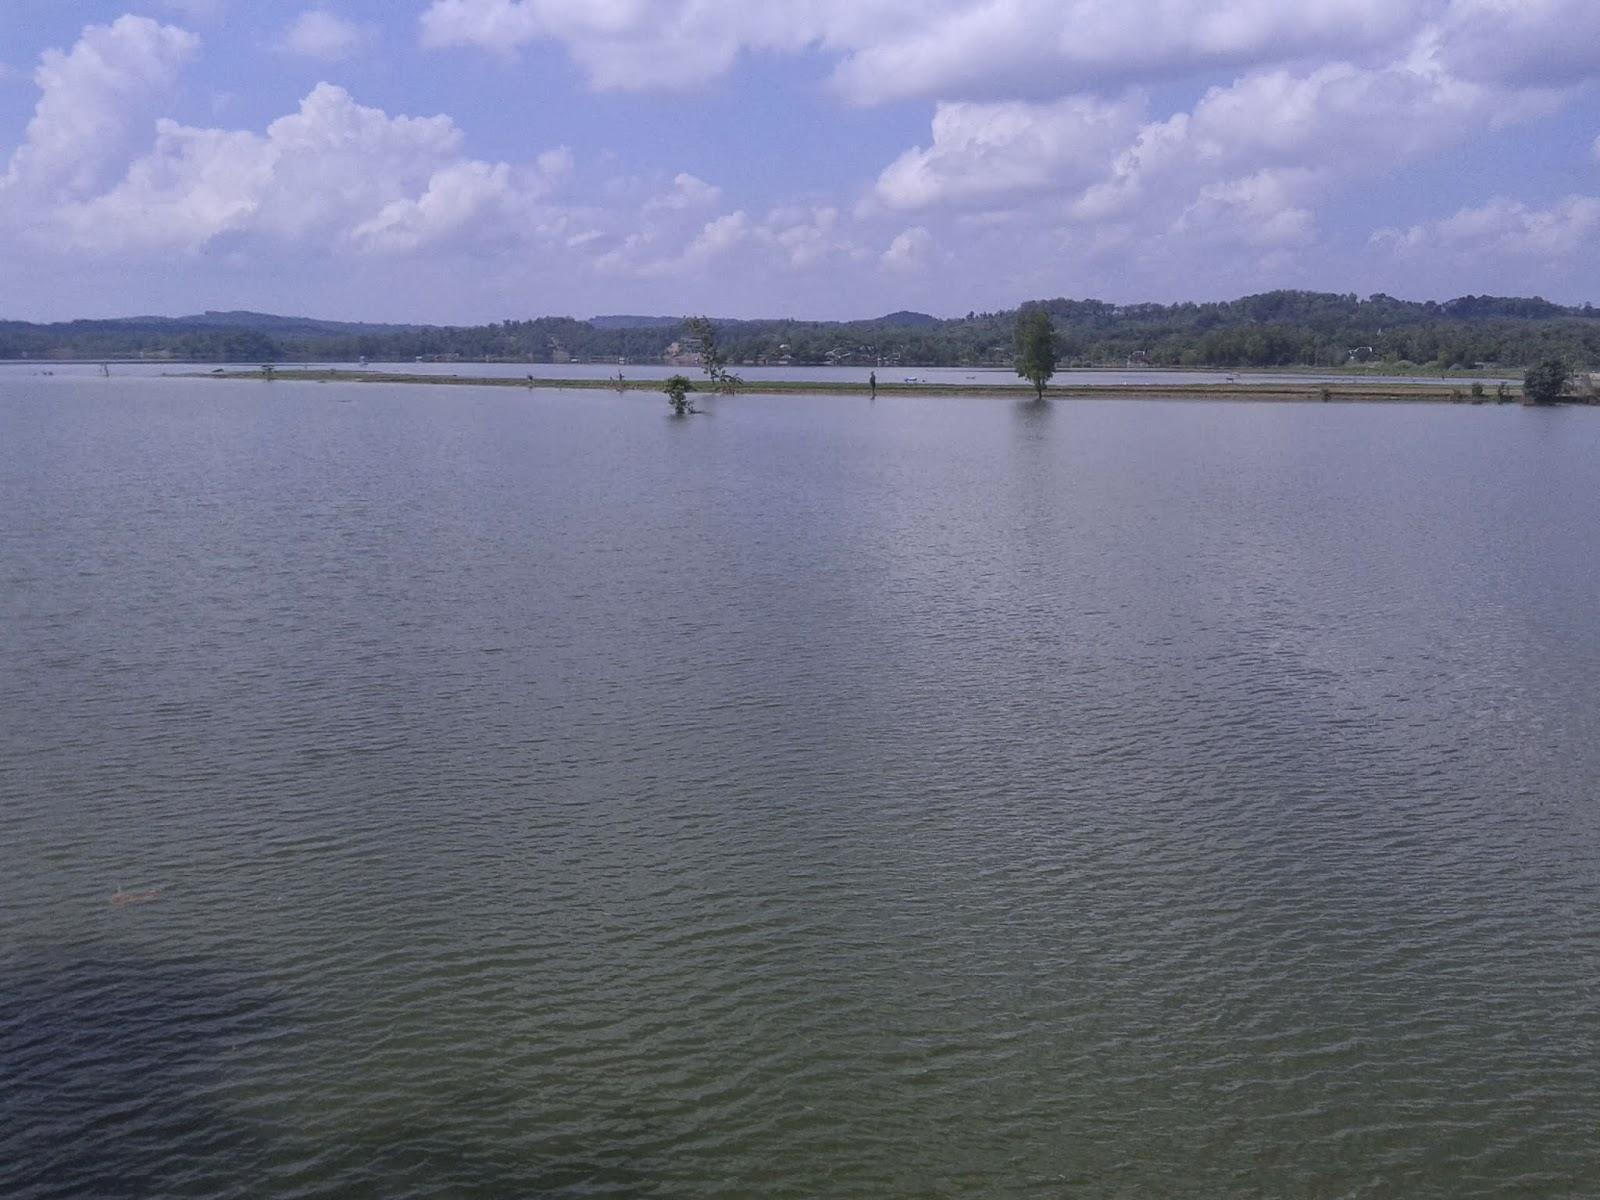 Banjir 2014 Waduk Kedung Ombo Jebol